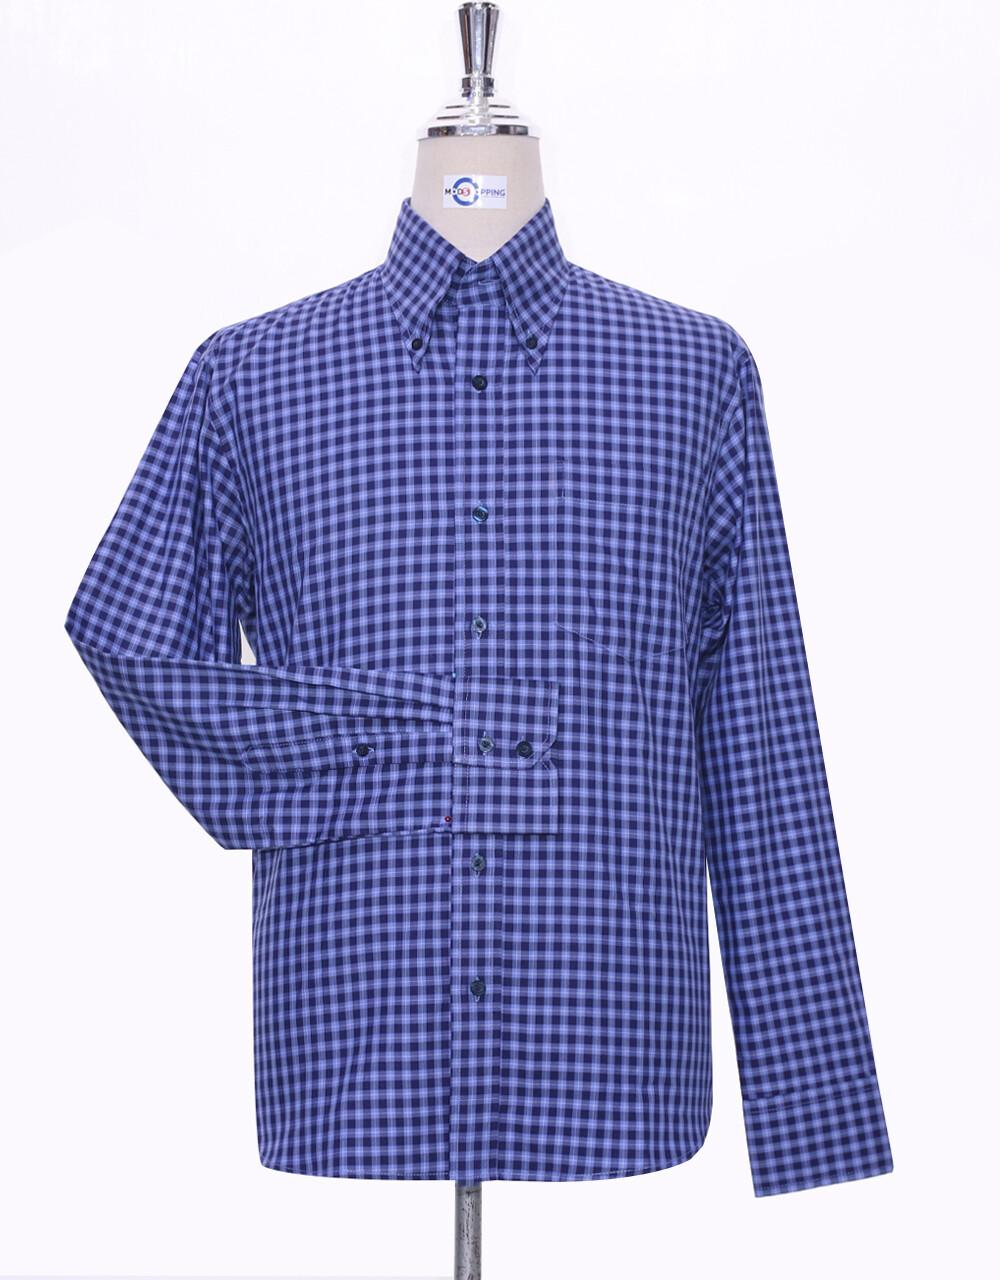 Button Down Shirt Blue Gingham Check Shirt